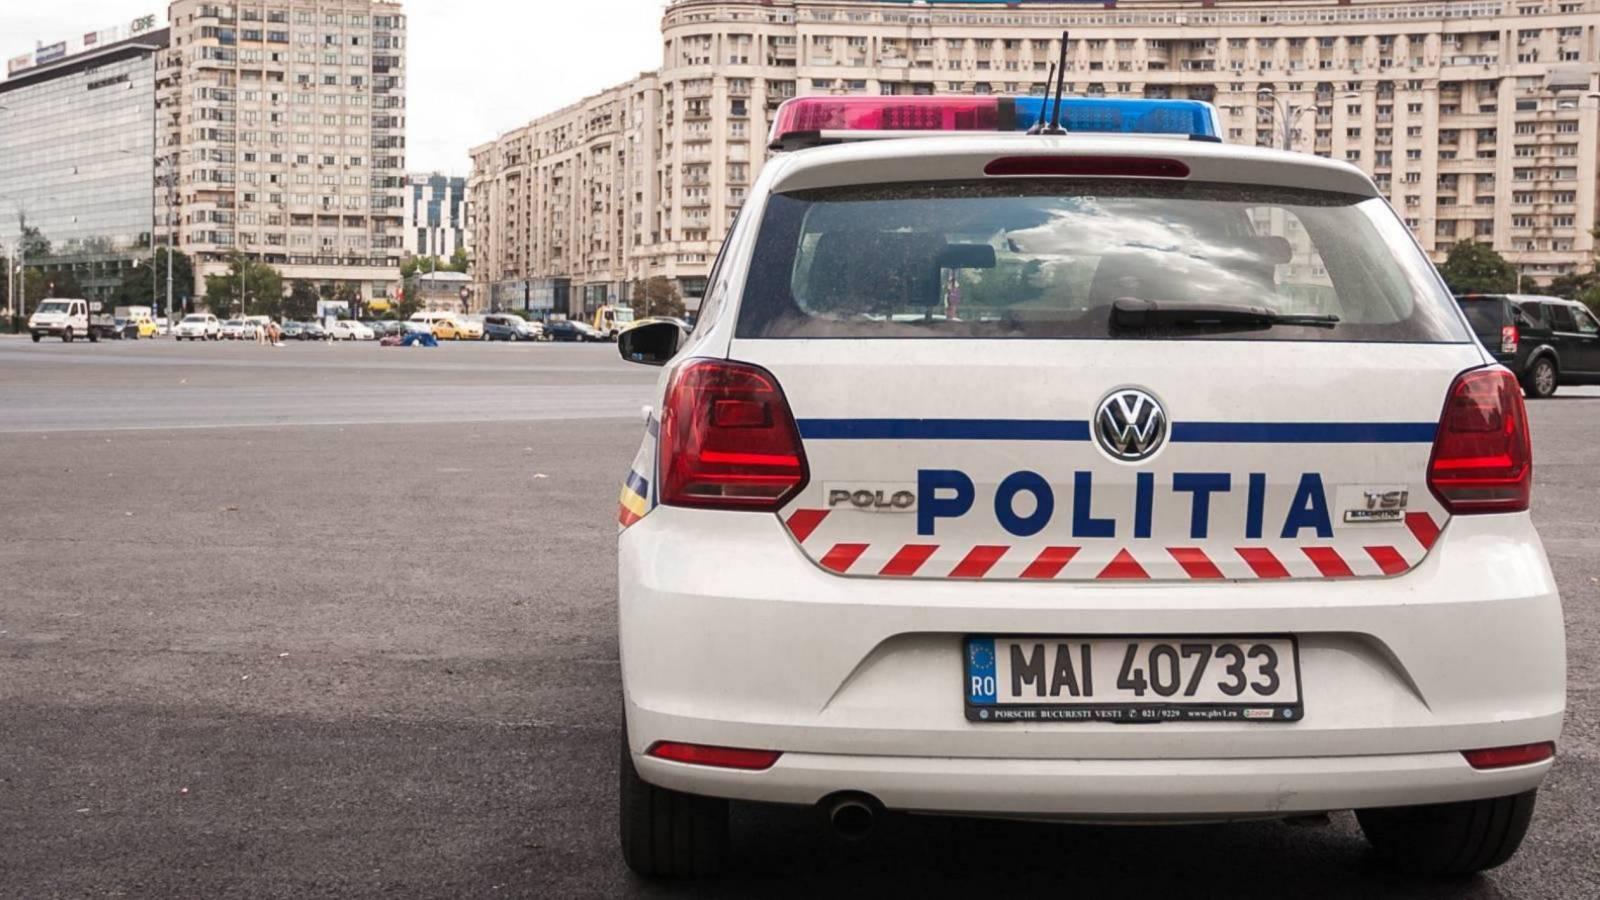 Politia Romana amenzi 24 ore pandemie